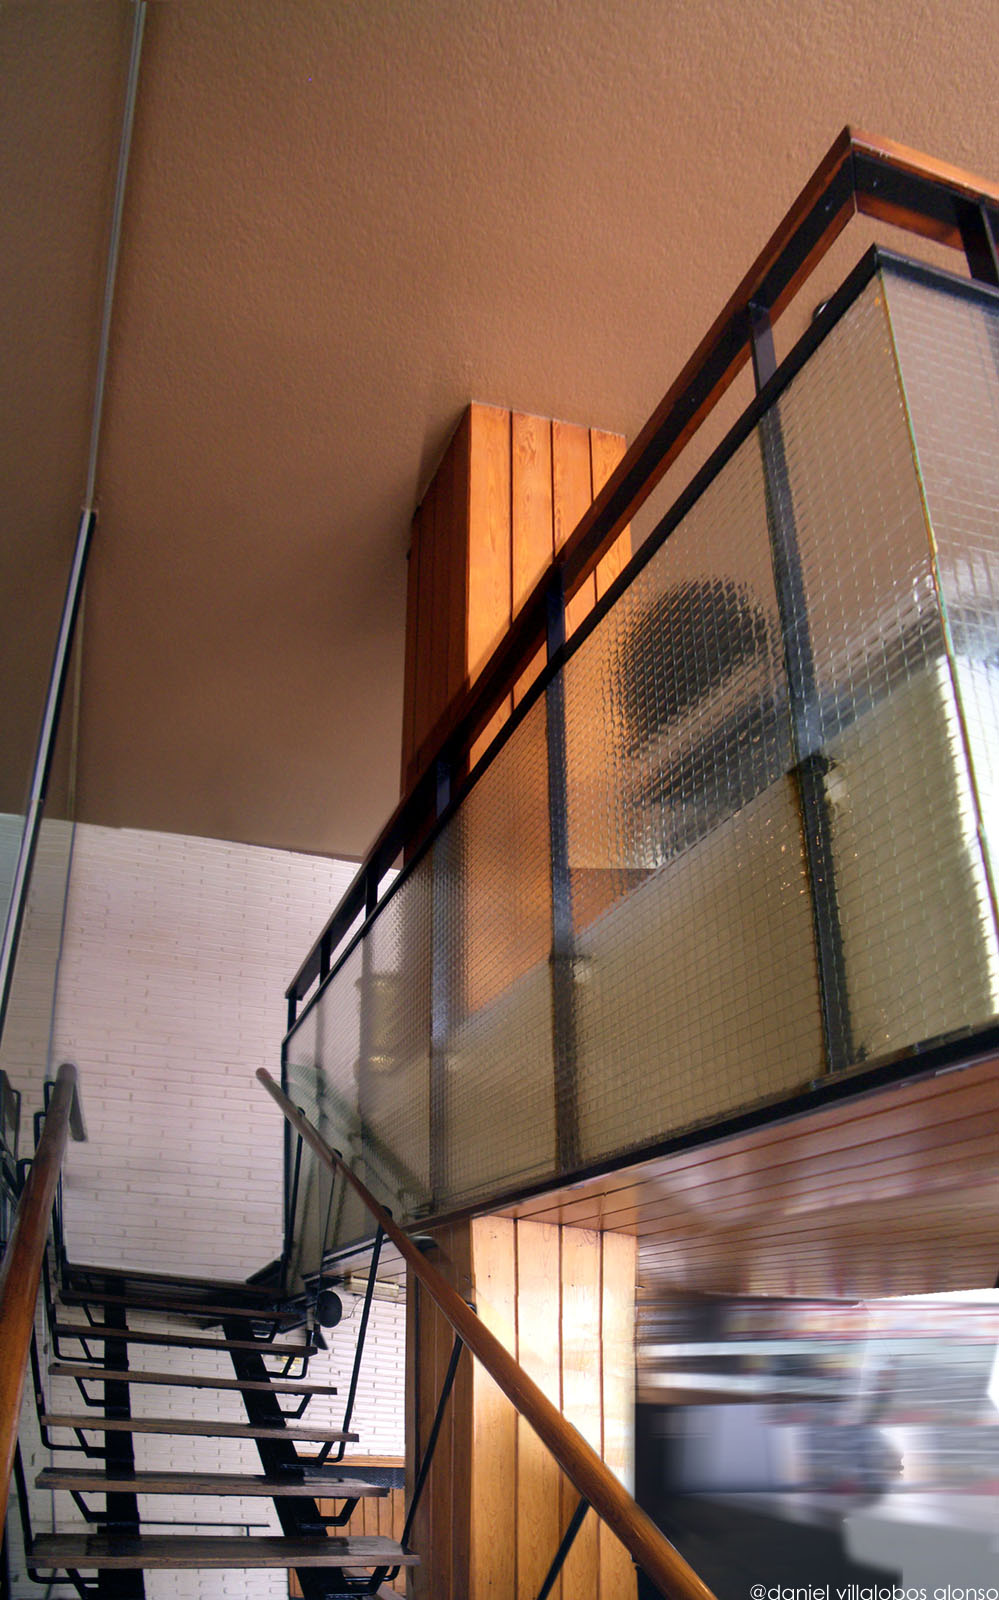 danielvillalobos-cines-digitalphotographies-modernarchitecture-61